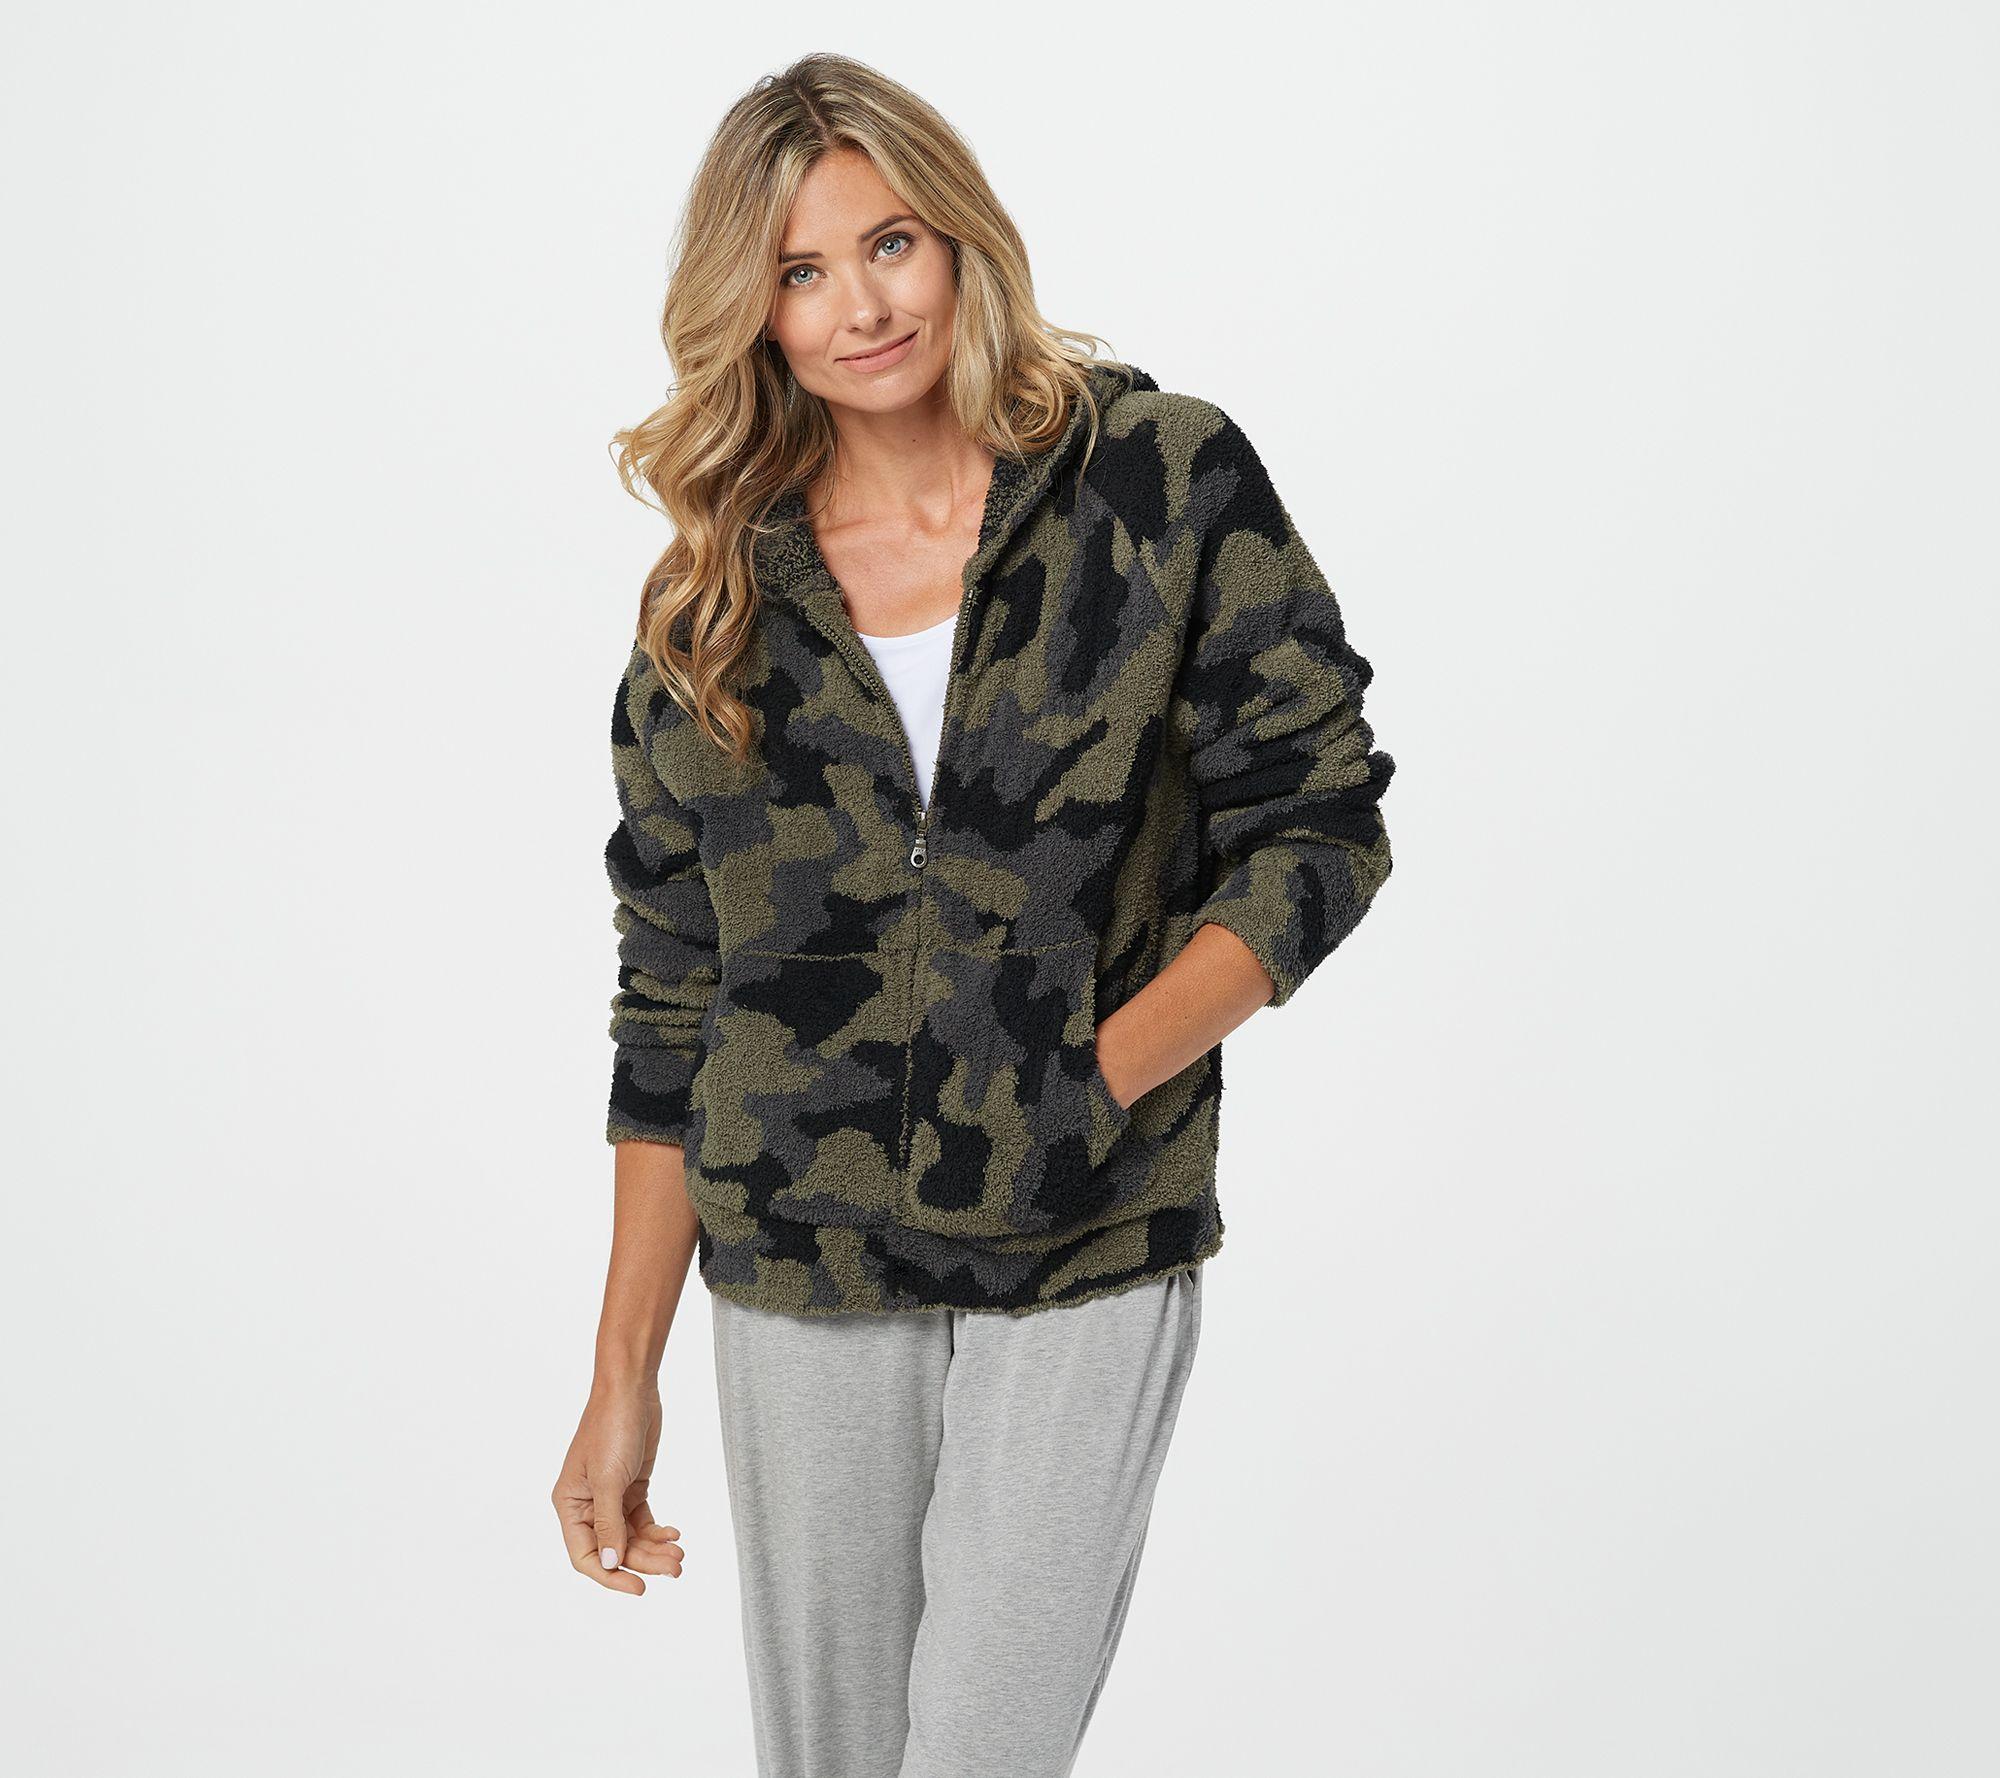 Hooded Zip-Up Jacket for Women Barefoot Dreams CozyChic Camo Anorak